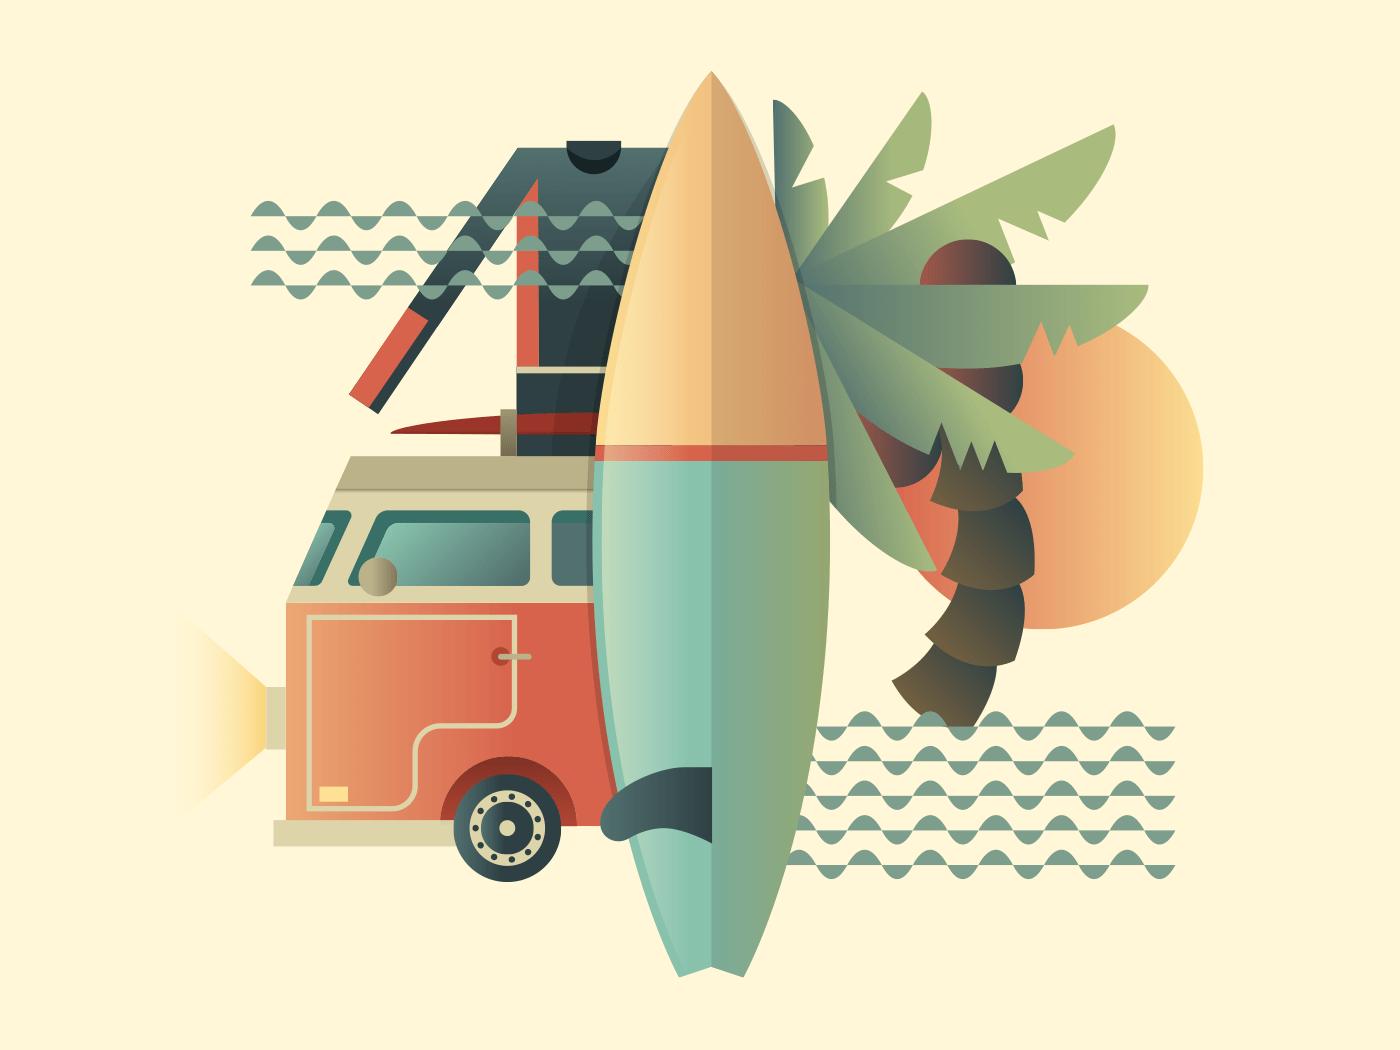 Surfing design illustration